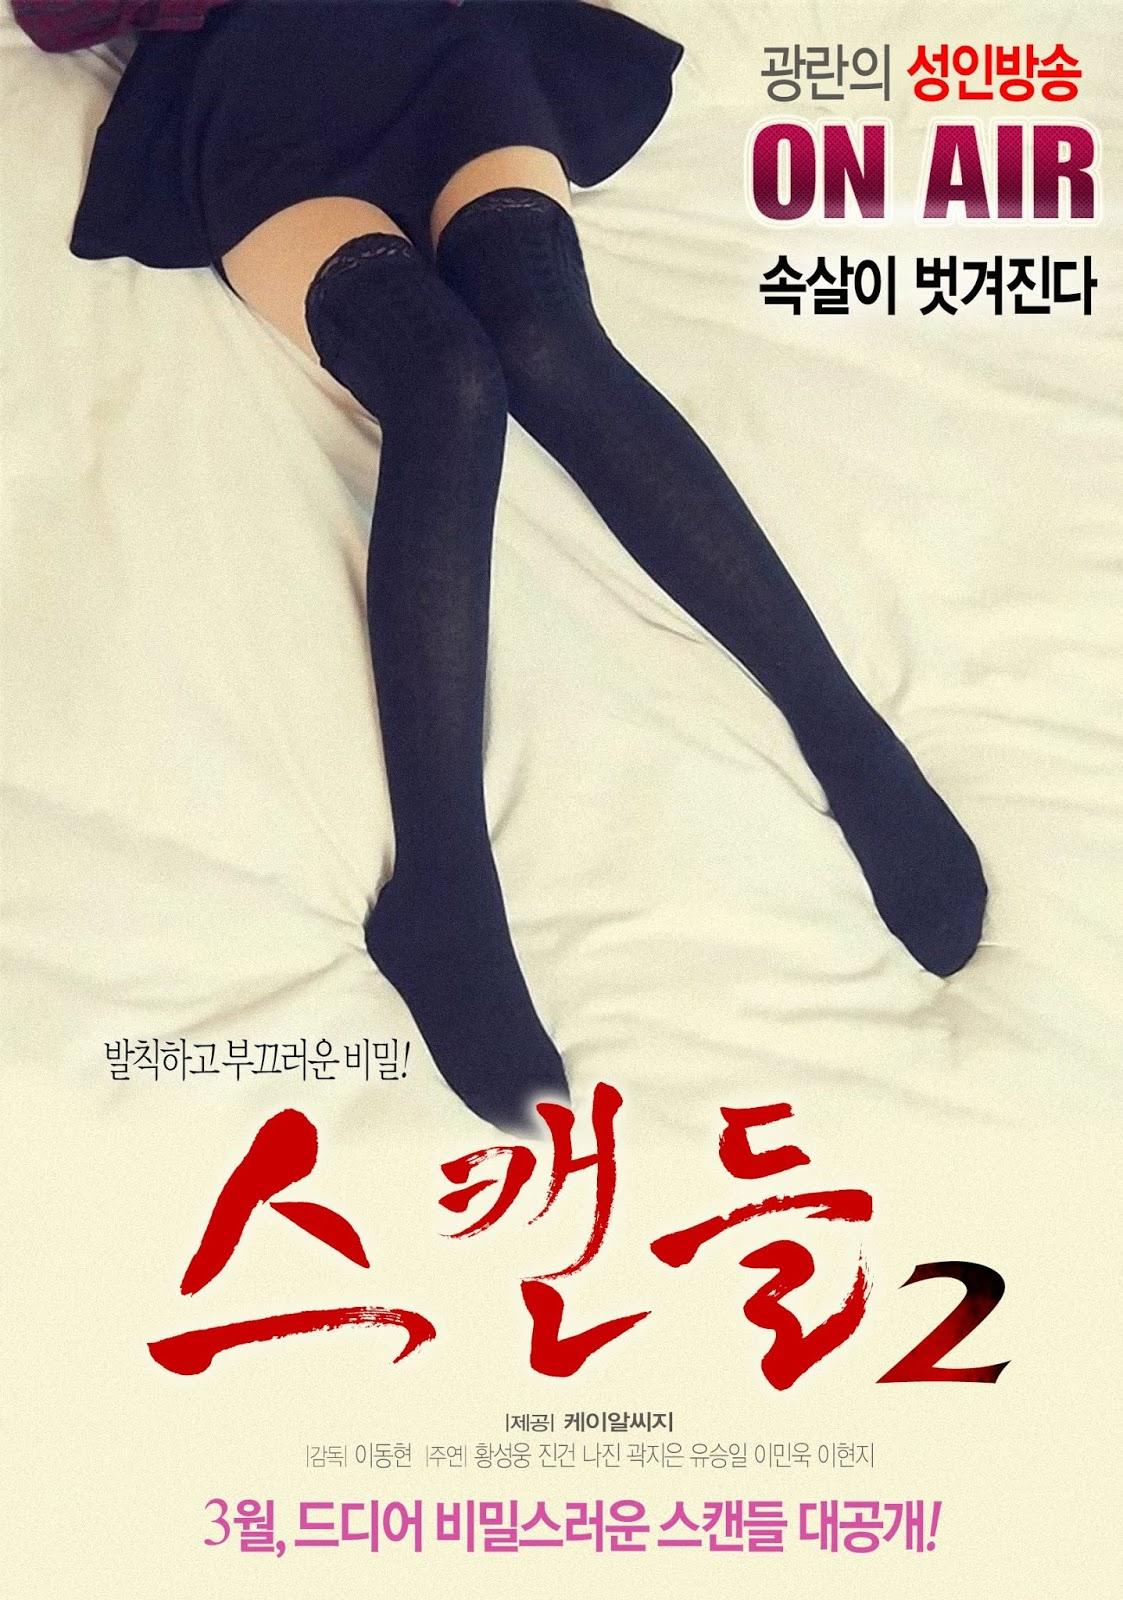 Scandal 2 Full Korea 18+ Adult Movie Online Free